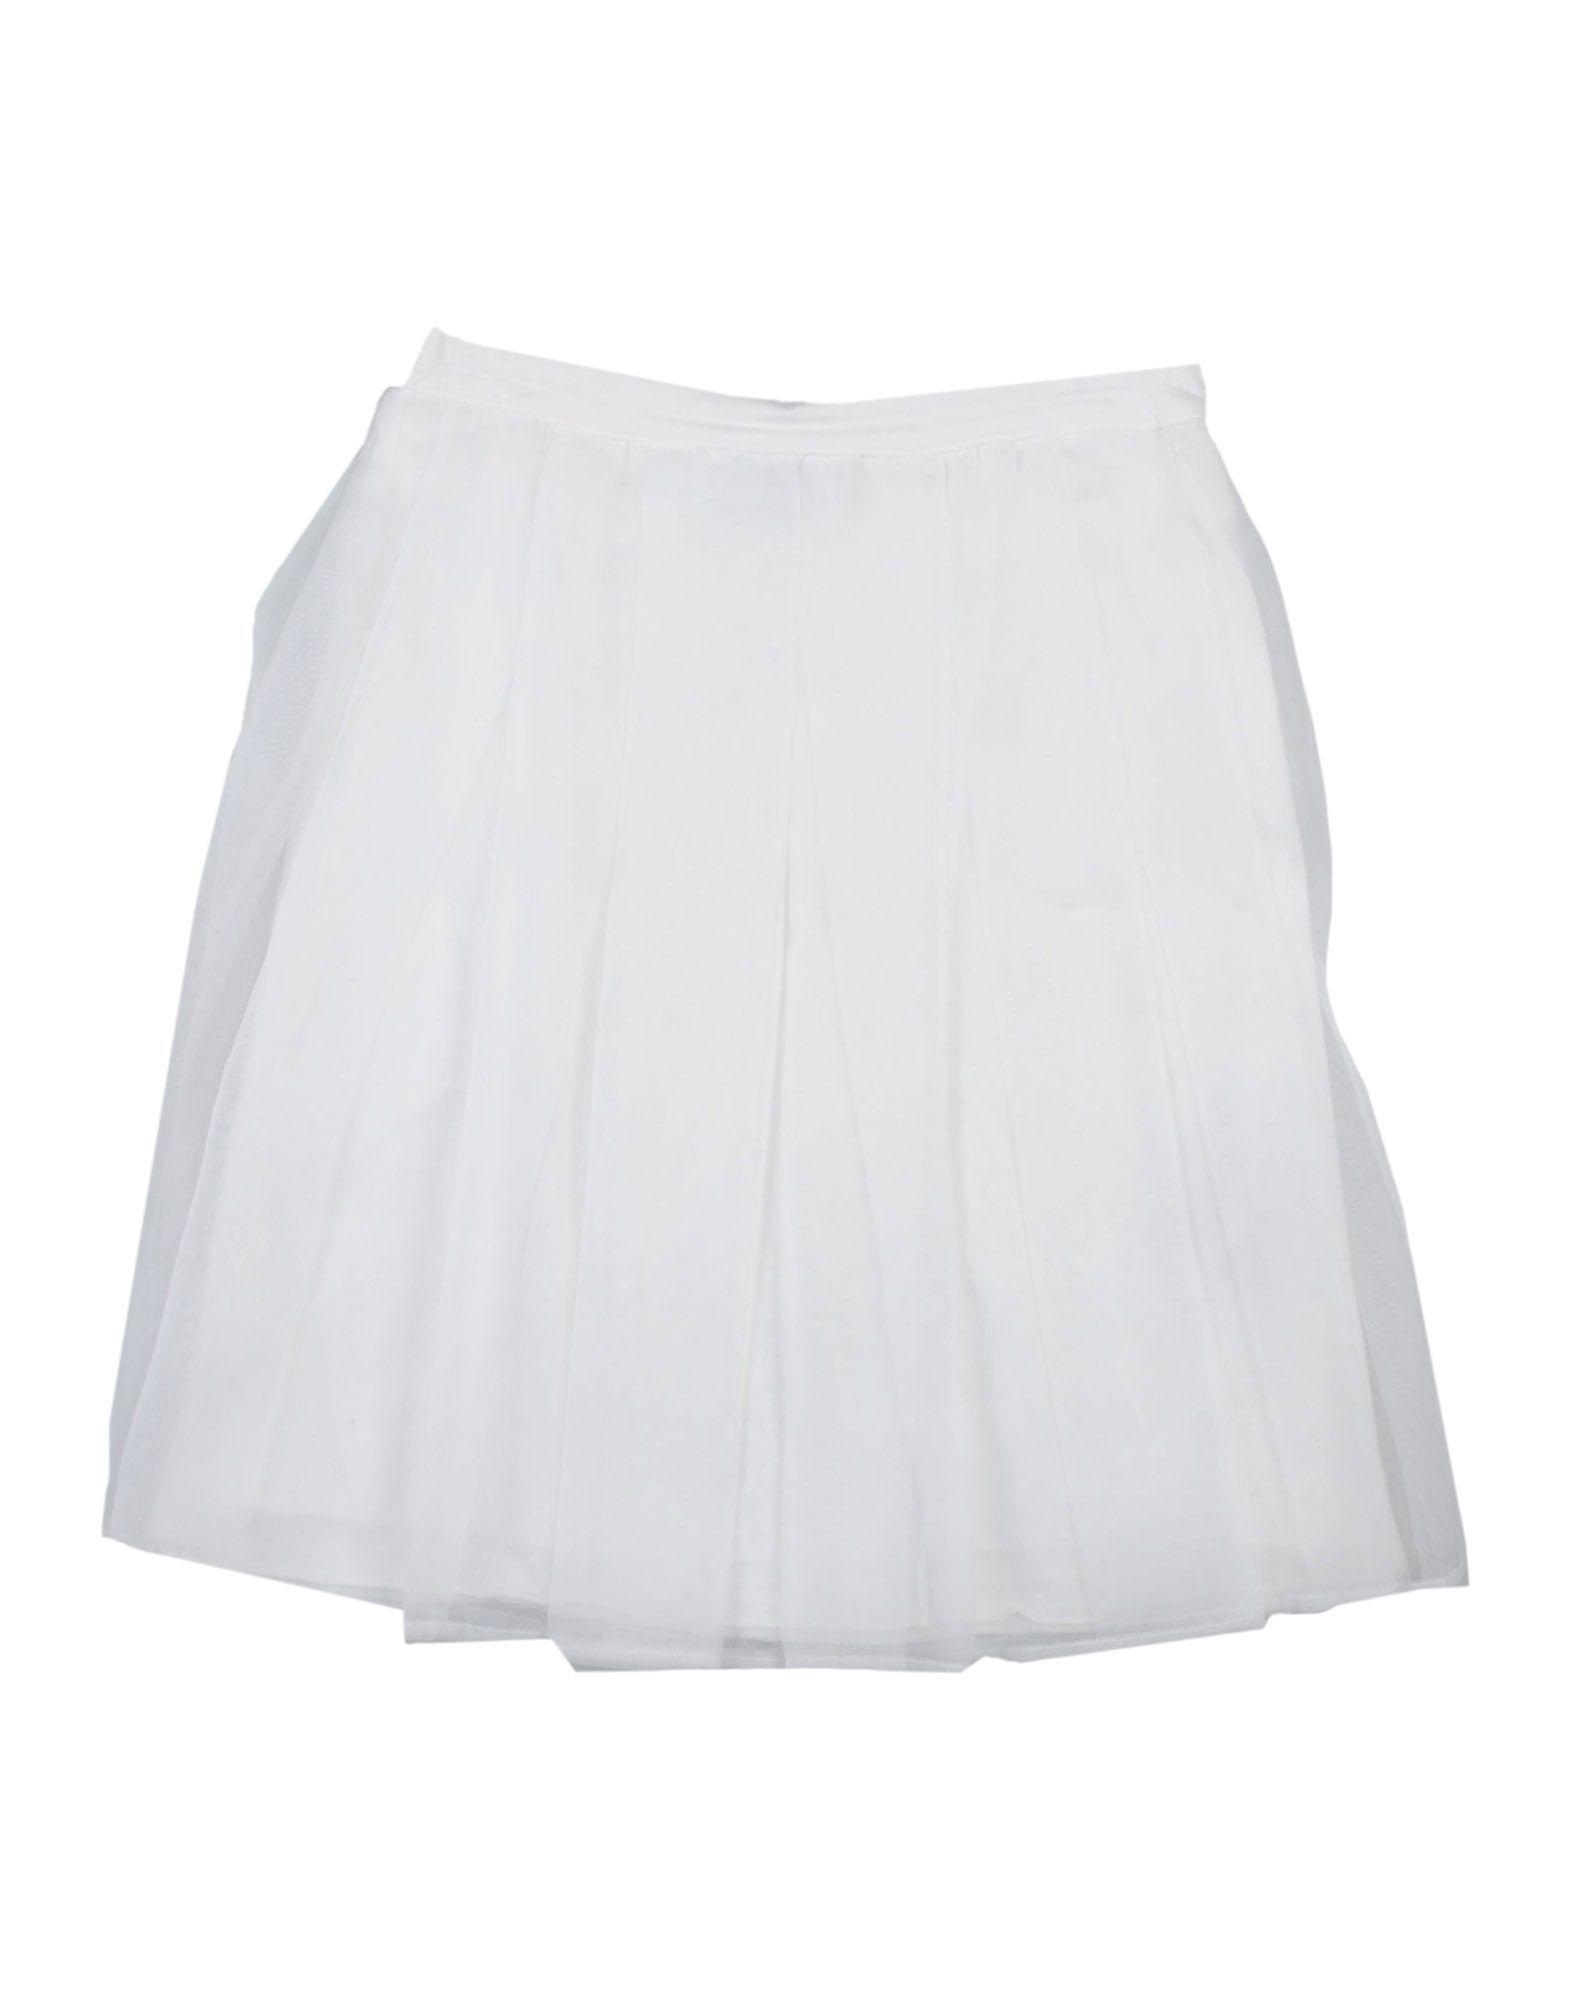 SKIRTS Ki6? Pretty White Girl Polyester